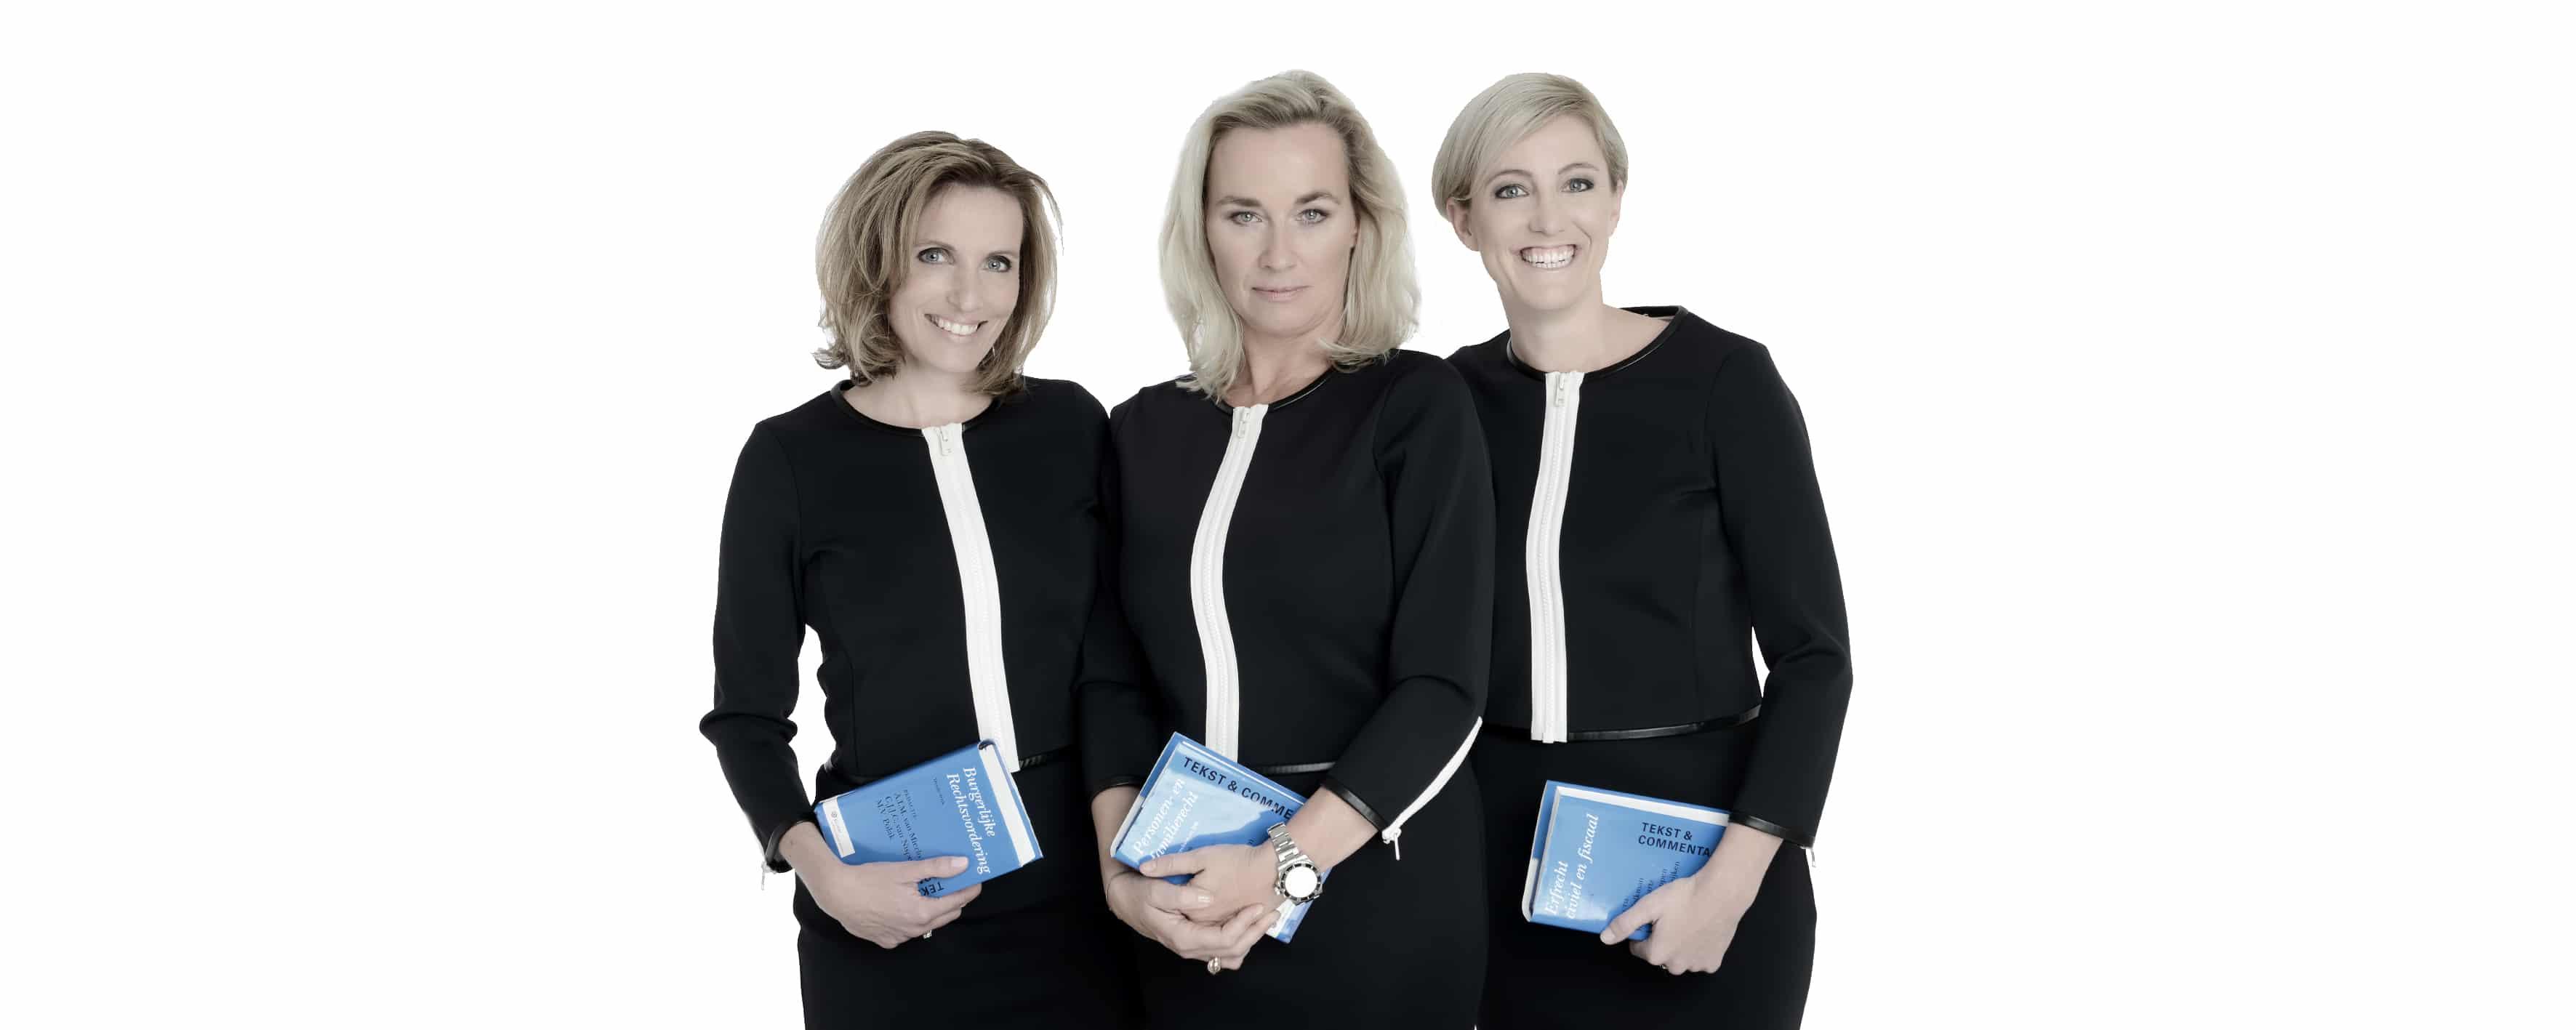 Vlaar-Zillikens-Bosch-Advocaten-Hoorn-Volendam-